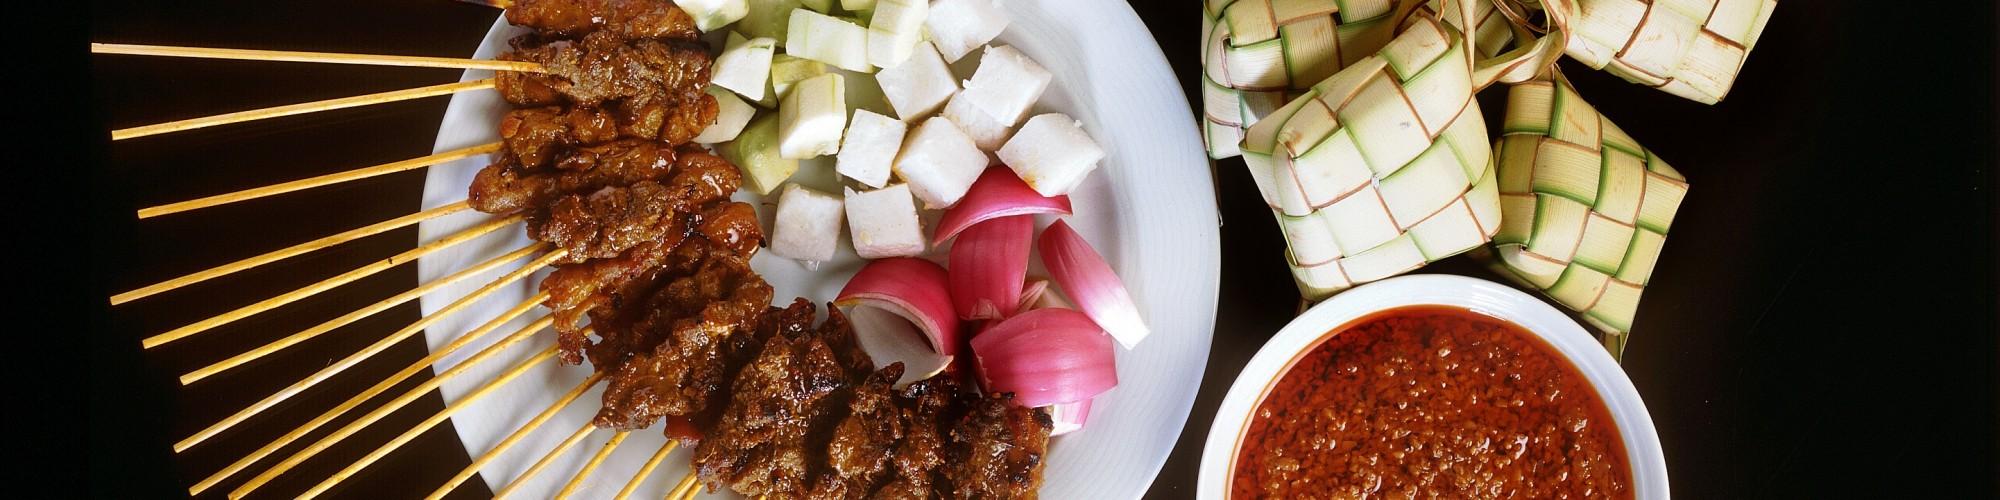 Local Food Satay - & Ketupat (Boilad Rice)